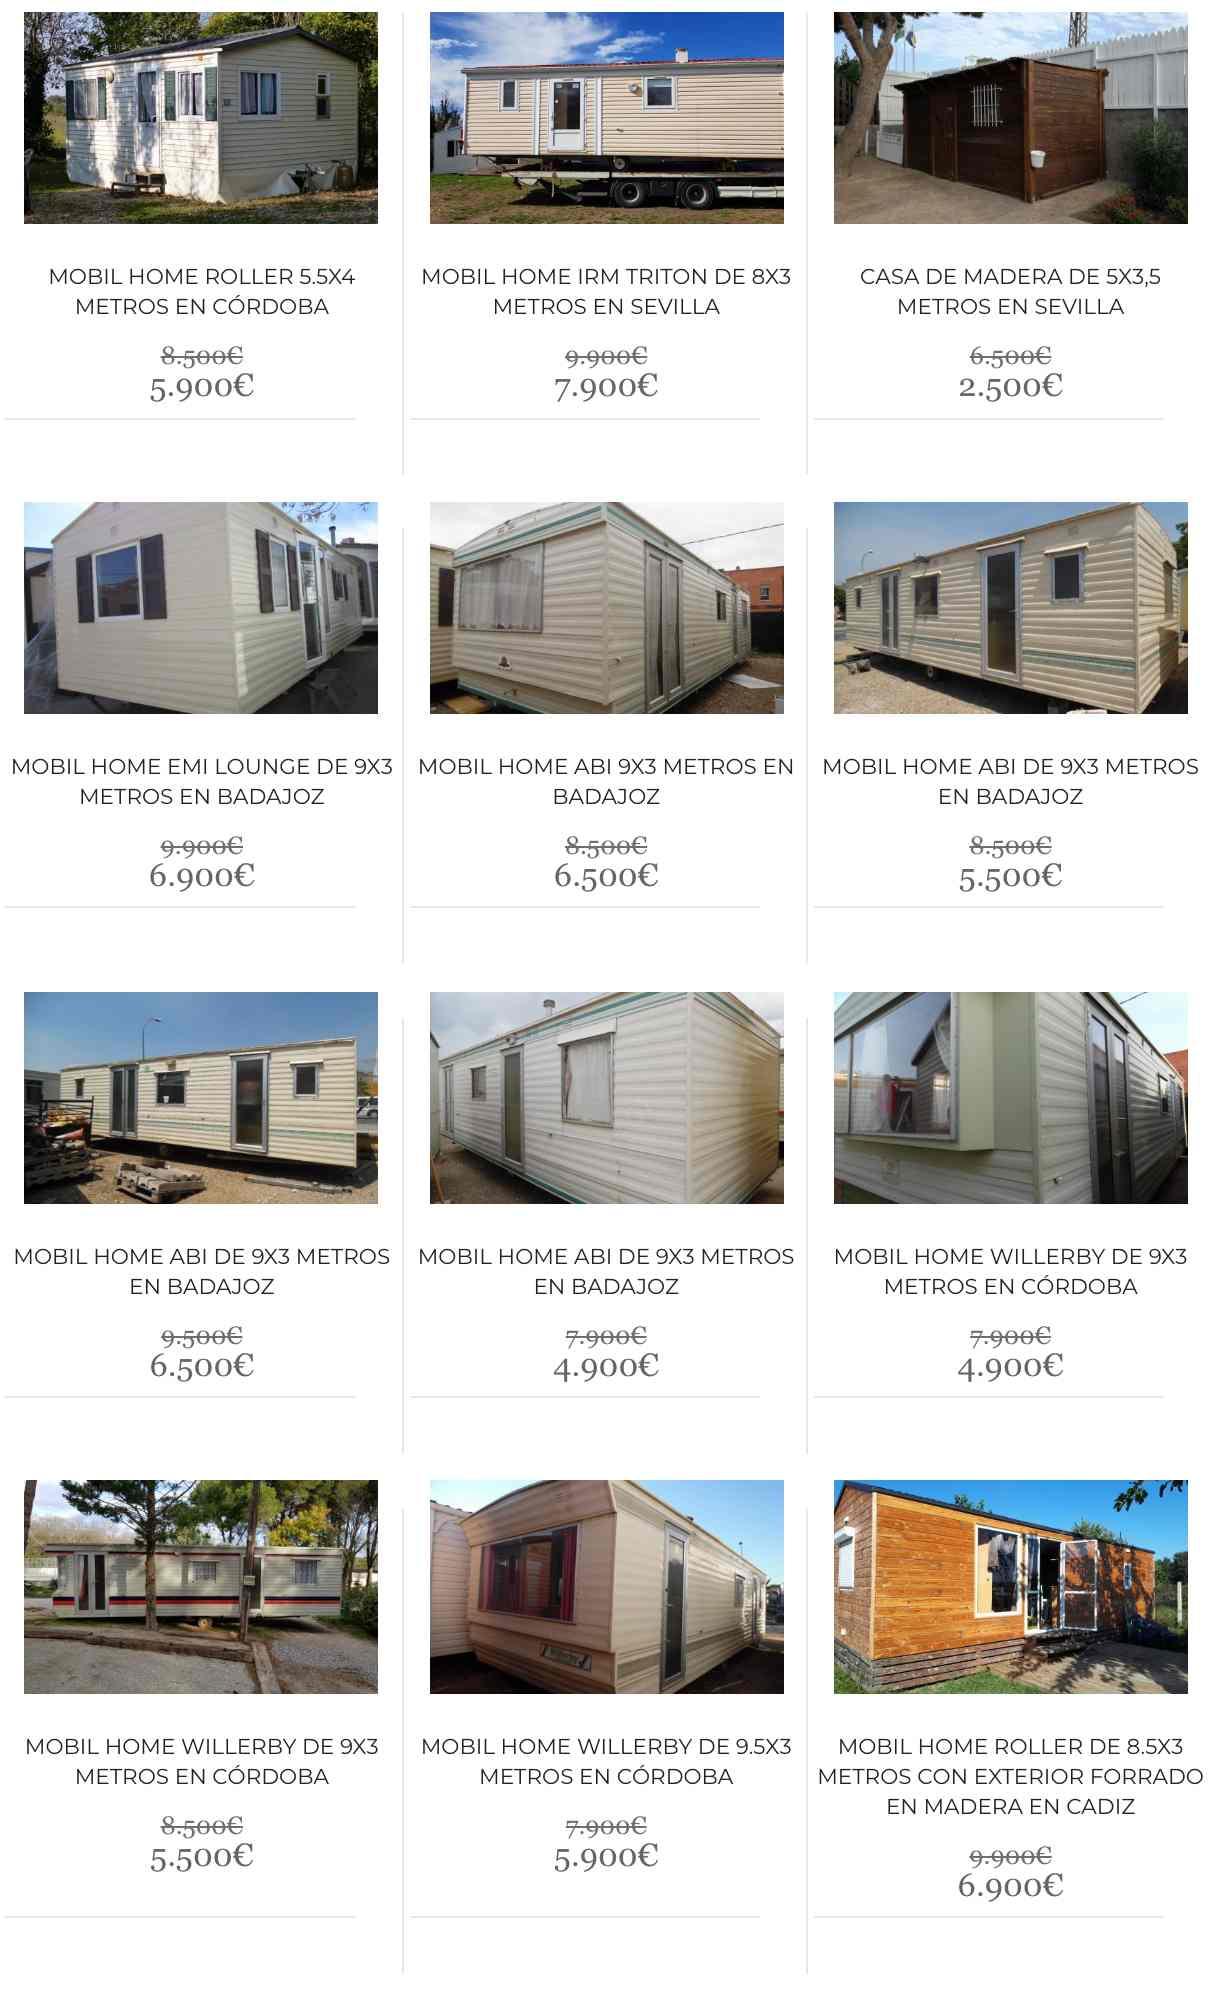 Oferta de casas prefabricadas baratas